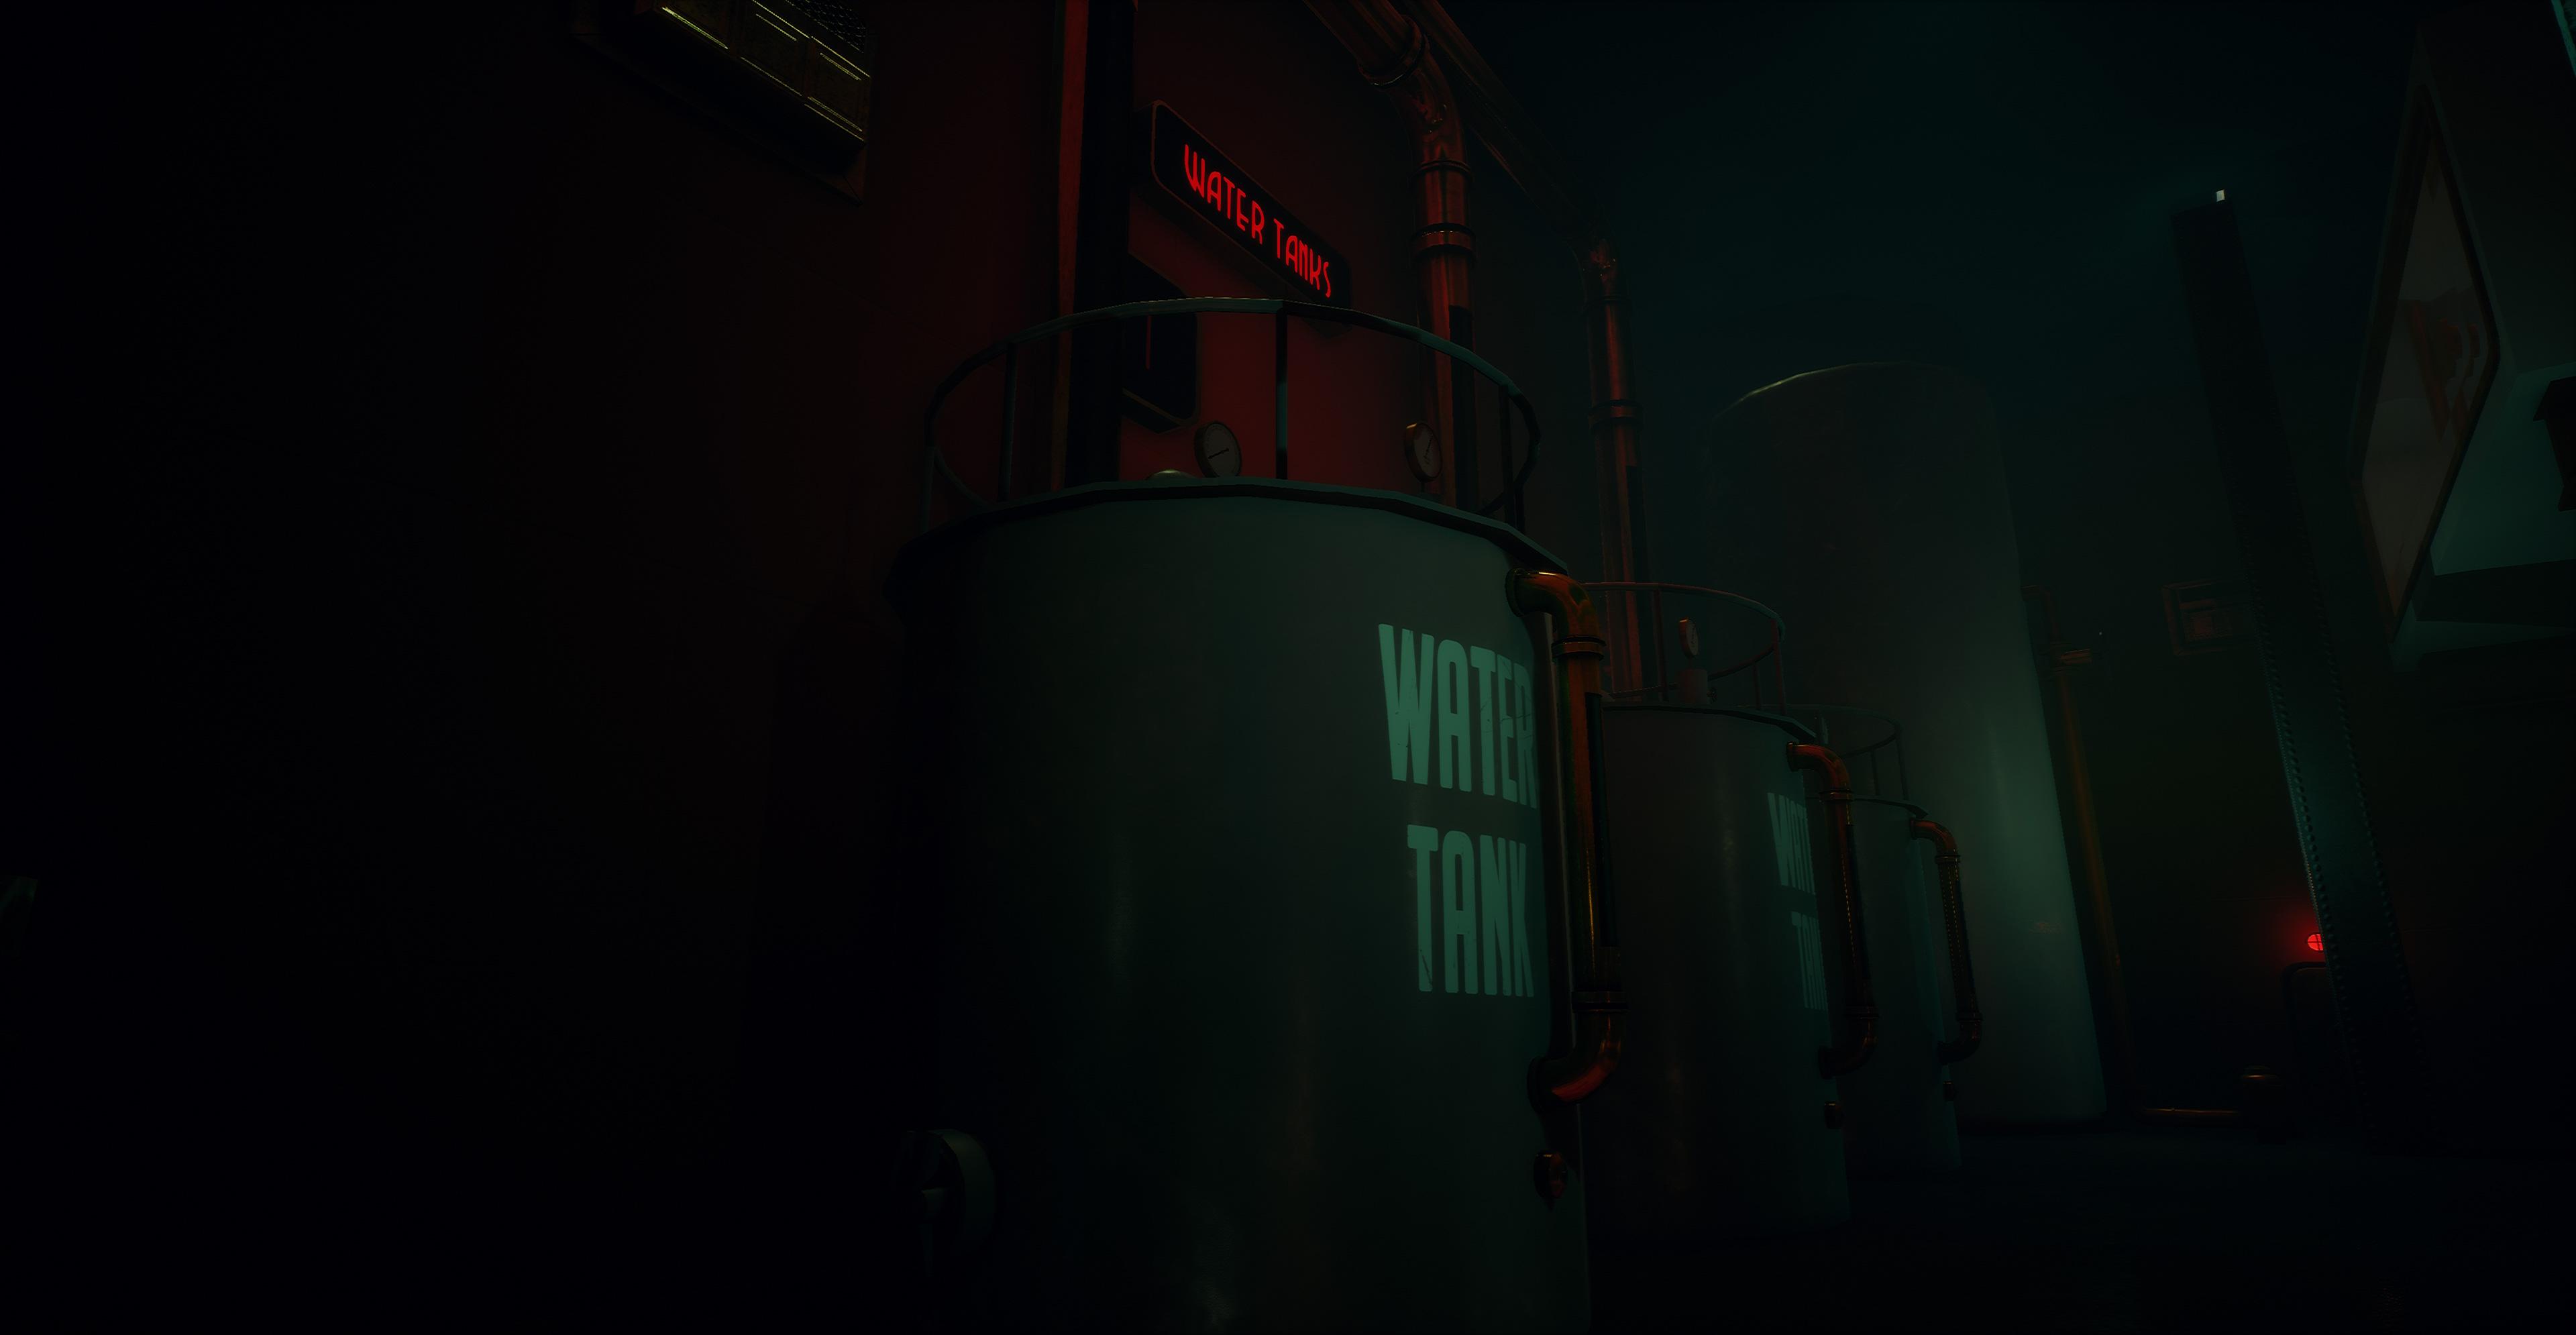 TechnoTsunami Boiler Room 2